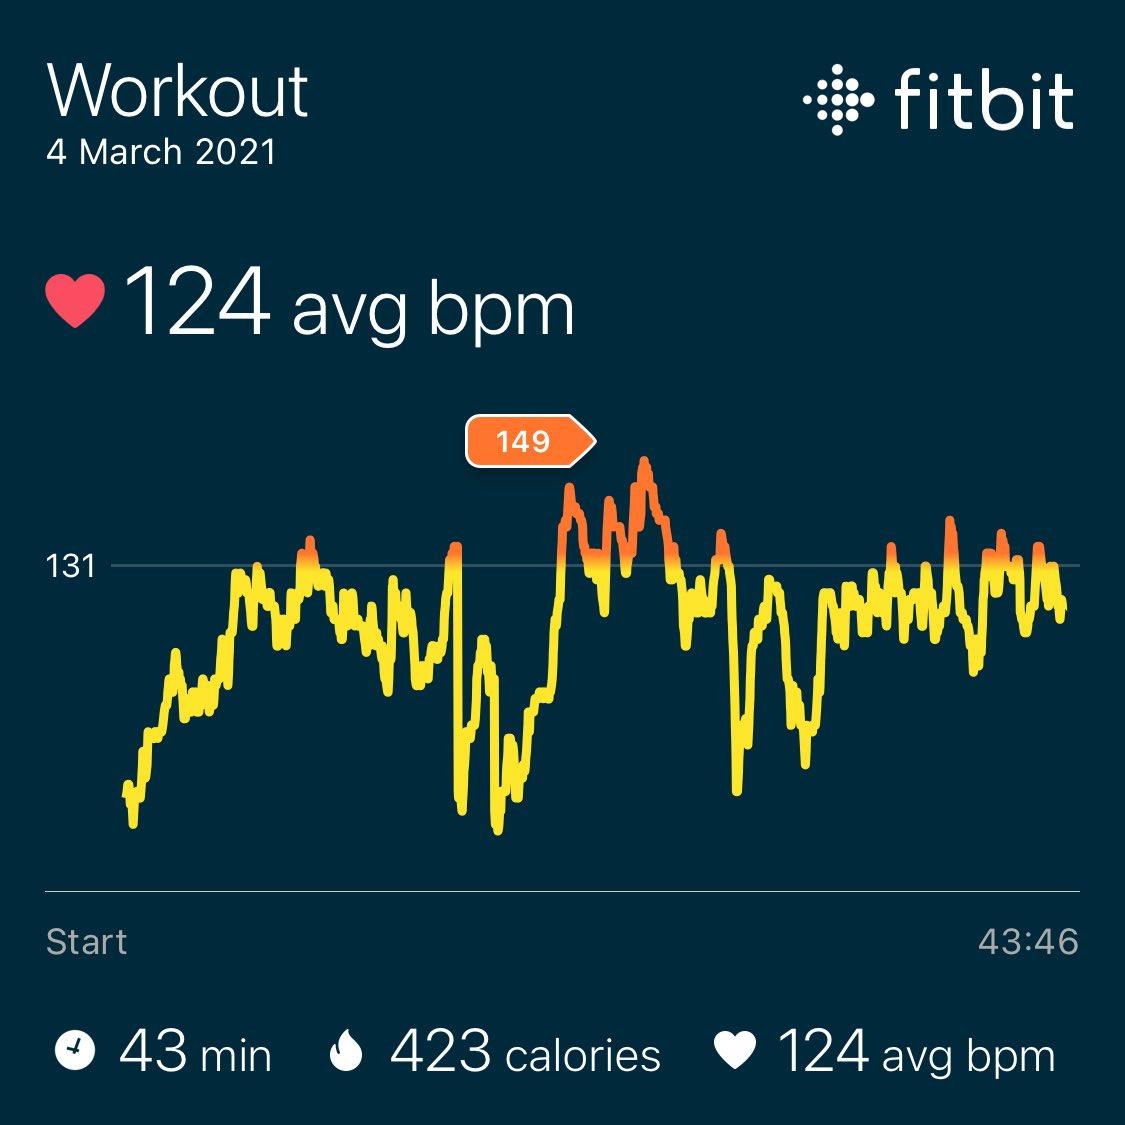 4/3/21 chest and shoulder #workoutathome #thursday #training #kettlebell #dumbbell #pushup #fitbit